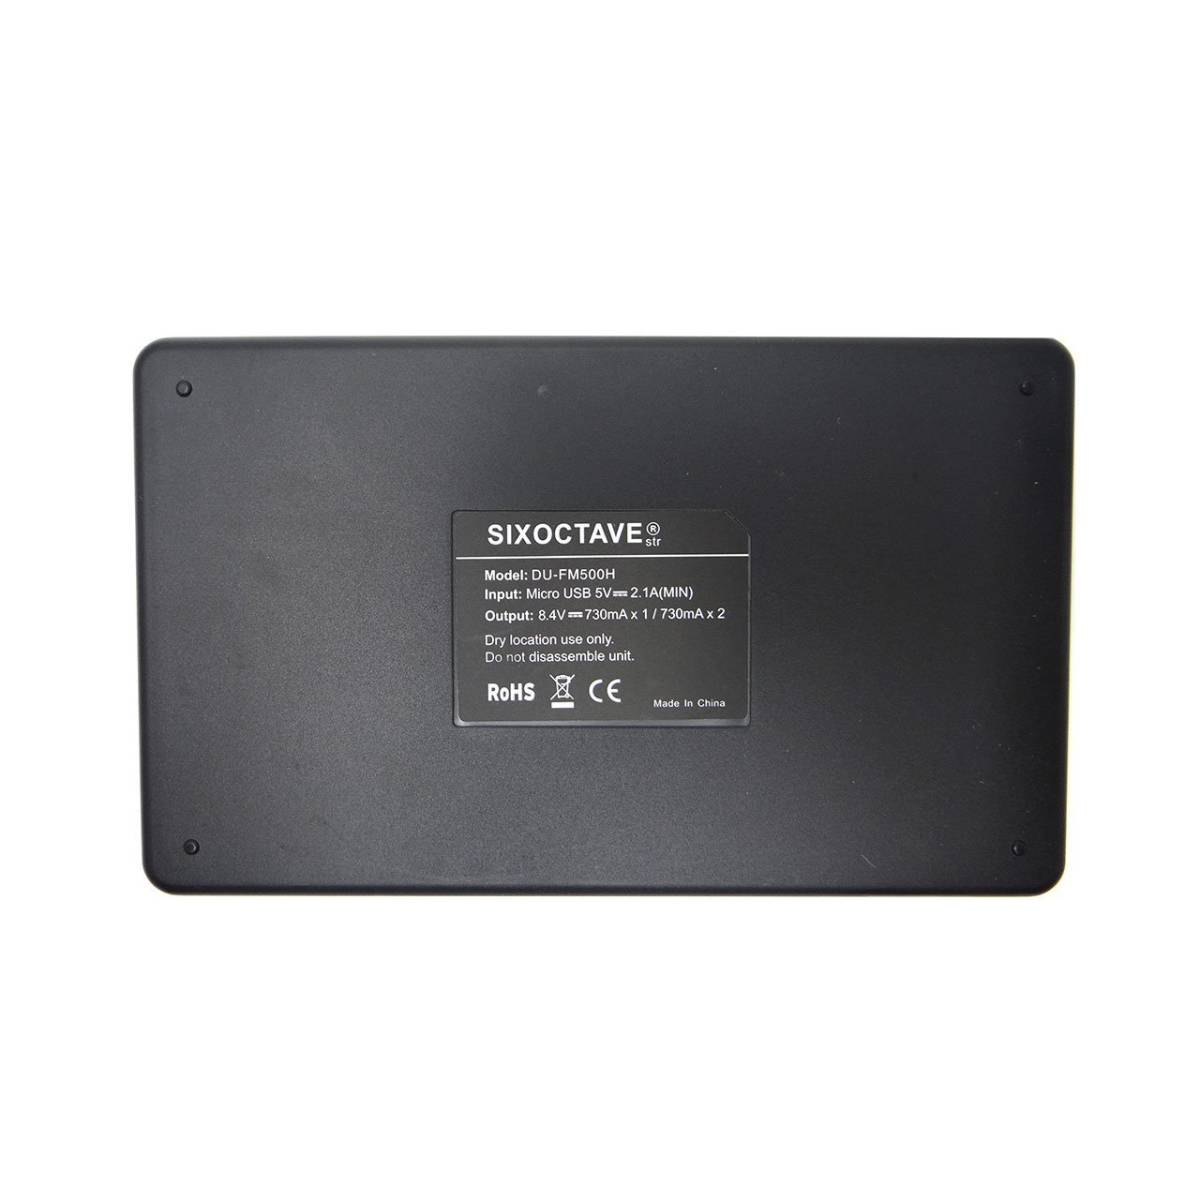 SONYソニーNP-F960/NP-F970 USBデュアル互換USB充電器Sony BC-V615/Sony DCM-M1/Sony DCR-TRU47E/Sony HDR-FX1/Sony HVR-Z1U Sony_画像4